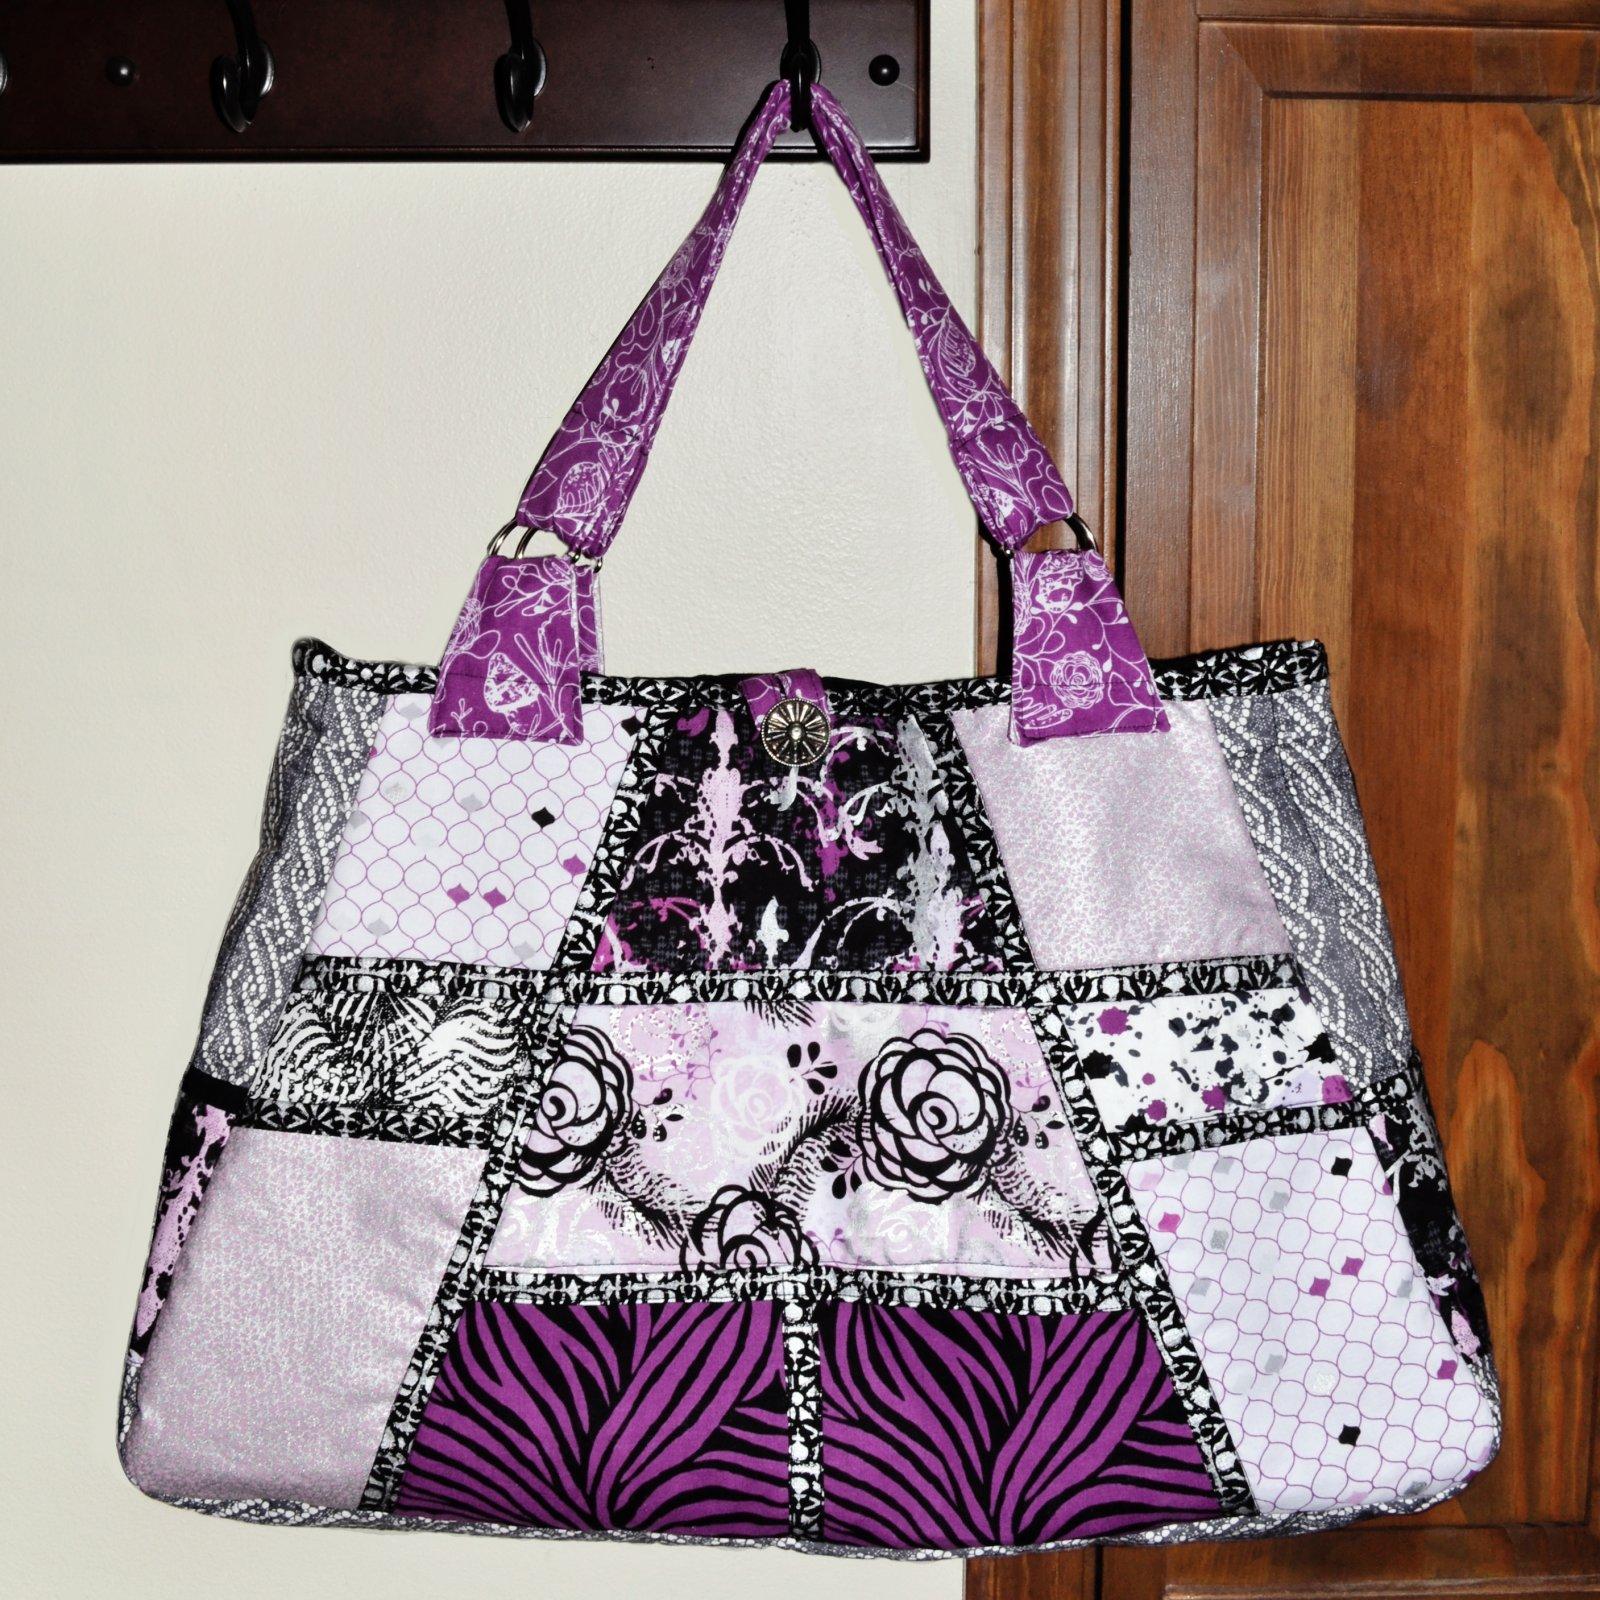 The City Bag Patchwork Design